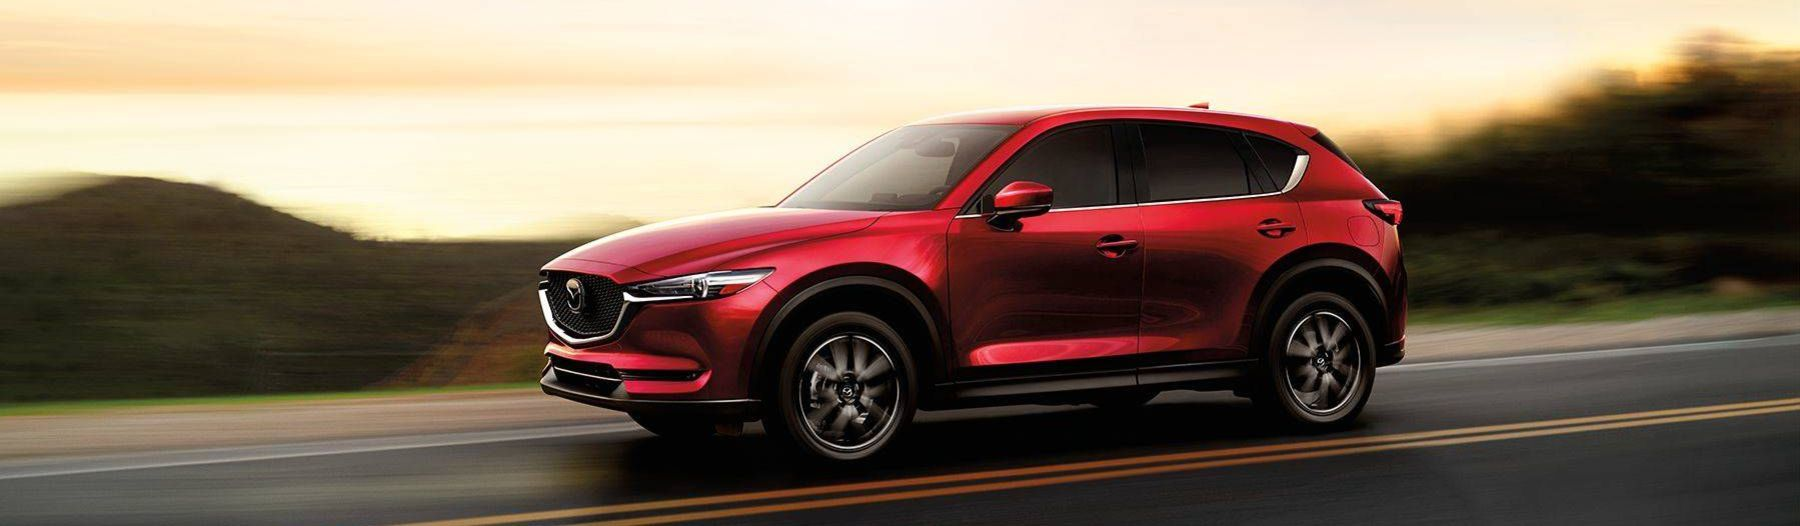 2018 Mazda CX-5 Financing in Waco, TX